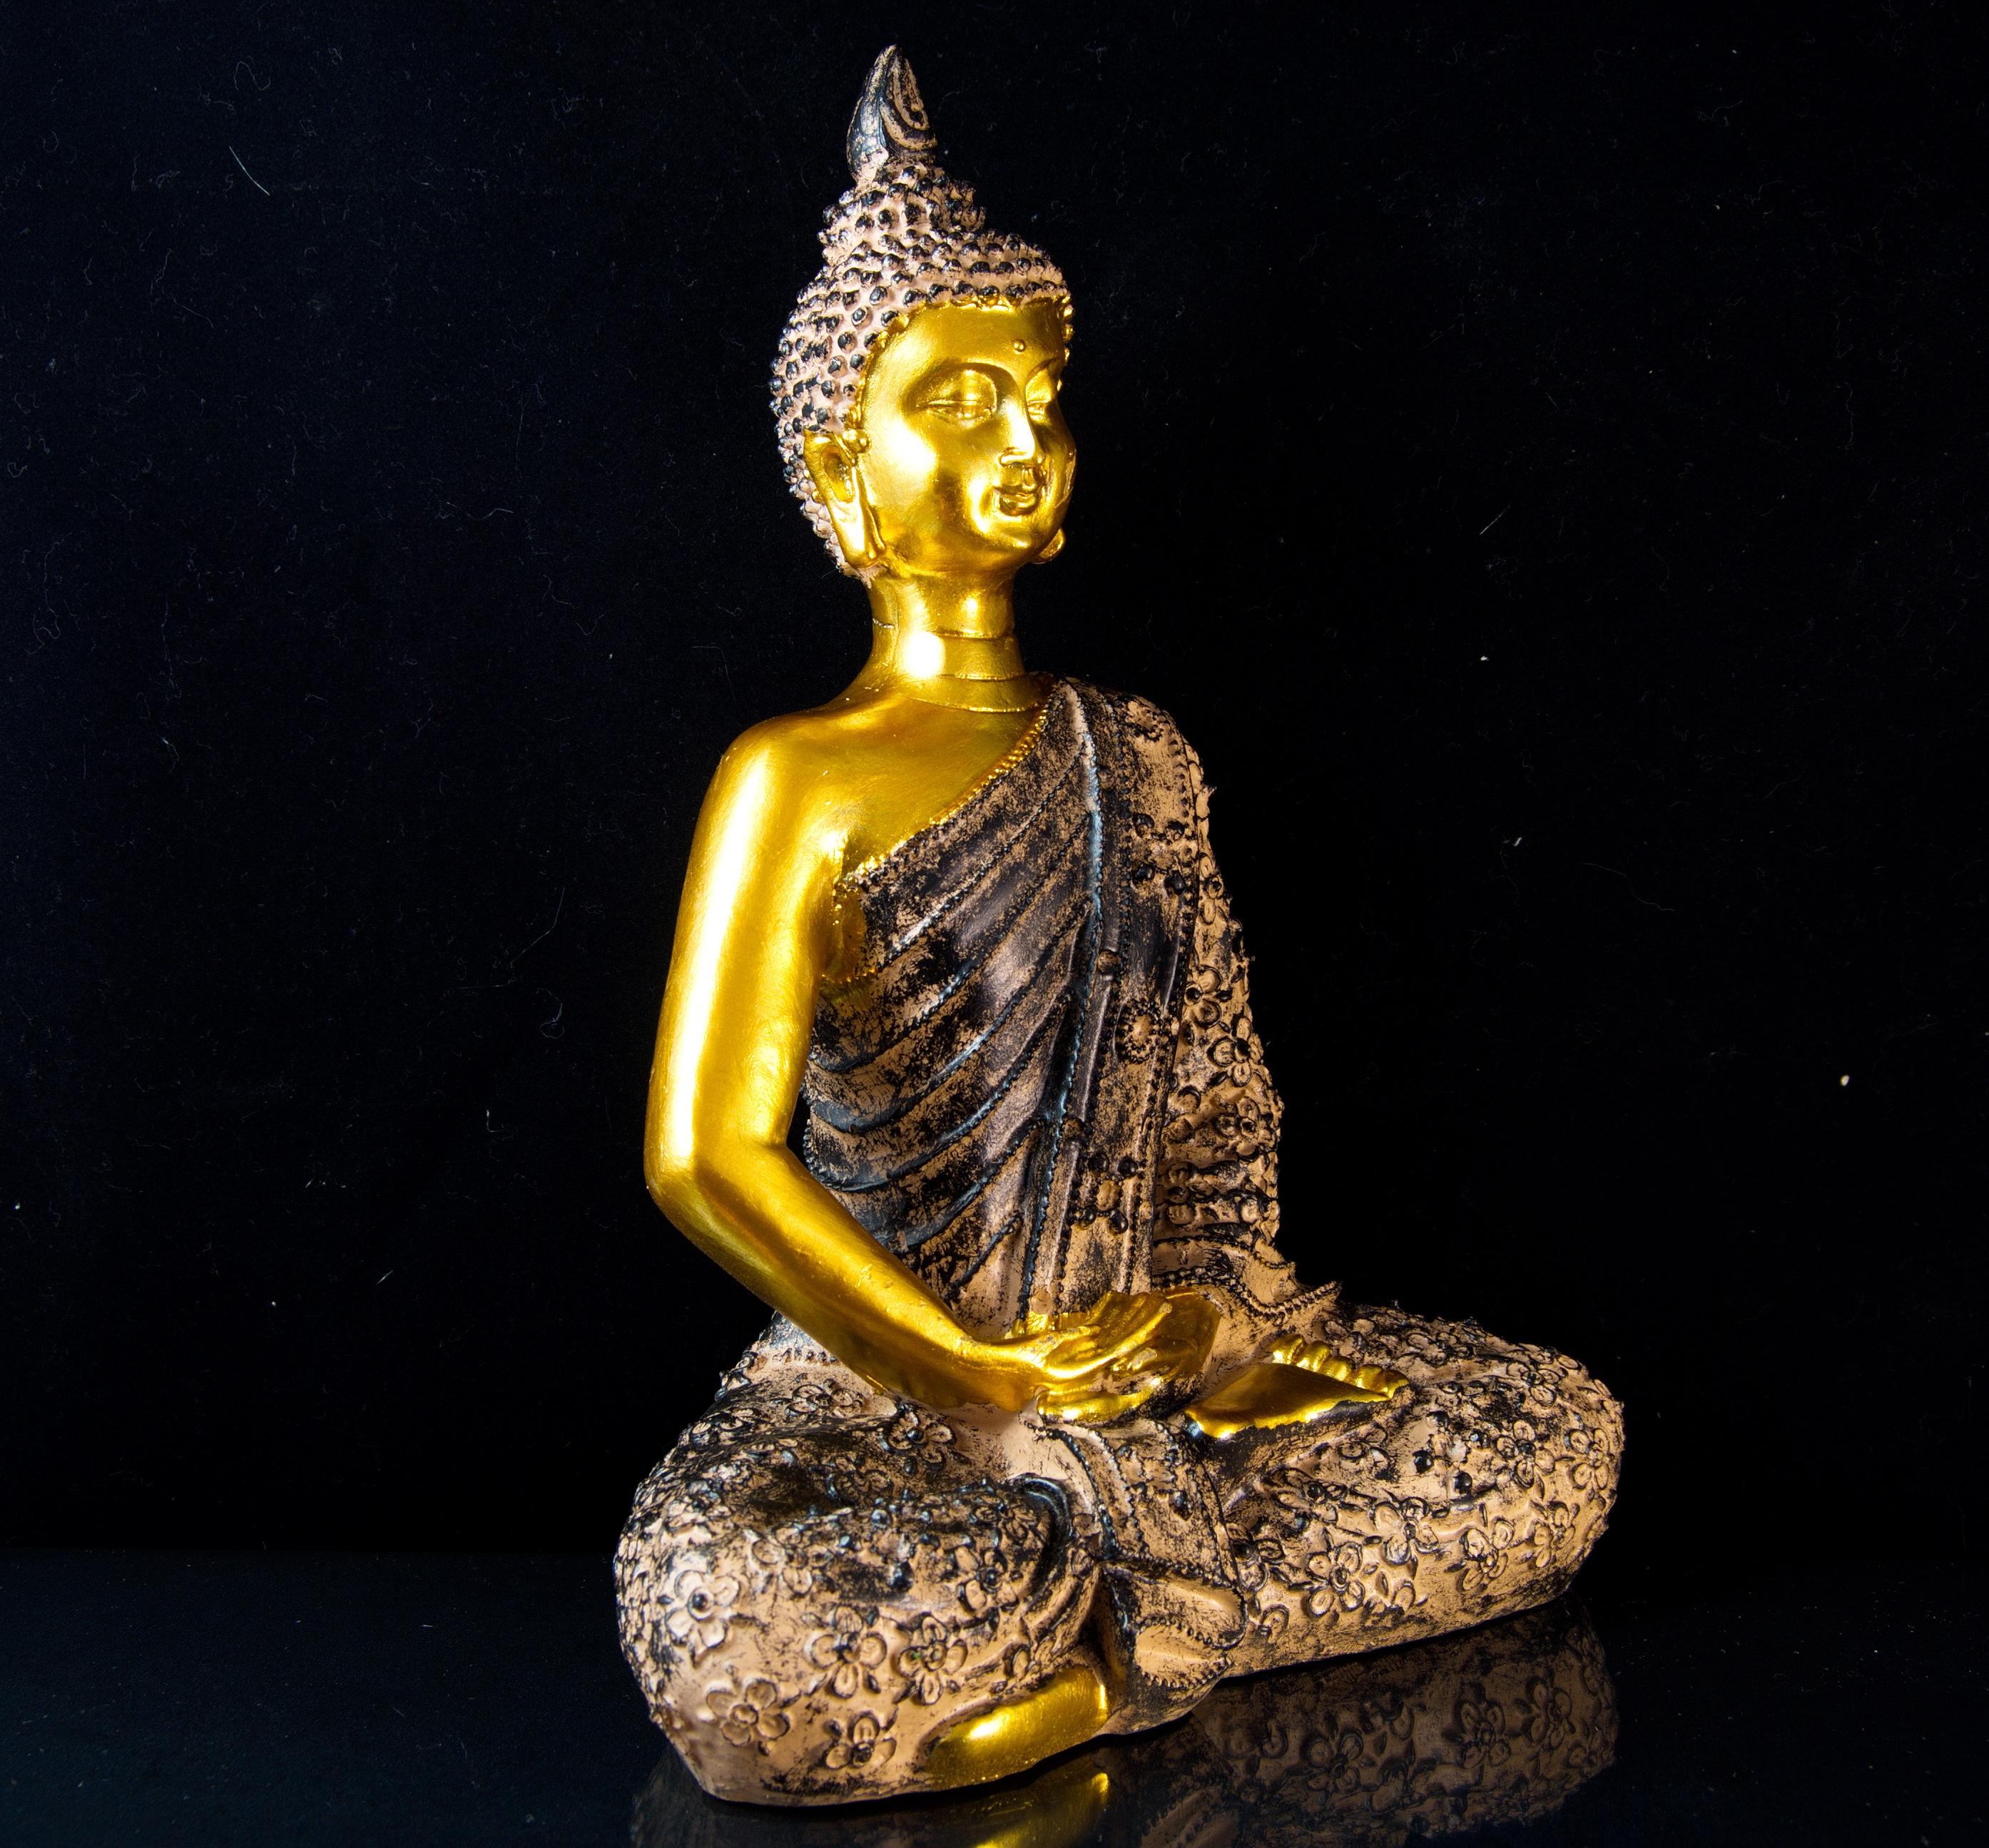 XL Thai Buddha Budda Figur Statue Feng Shui sitzend gold braun ca 35 cm NEU